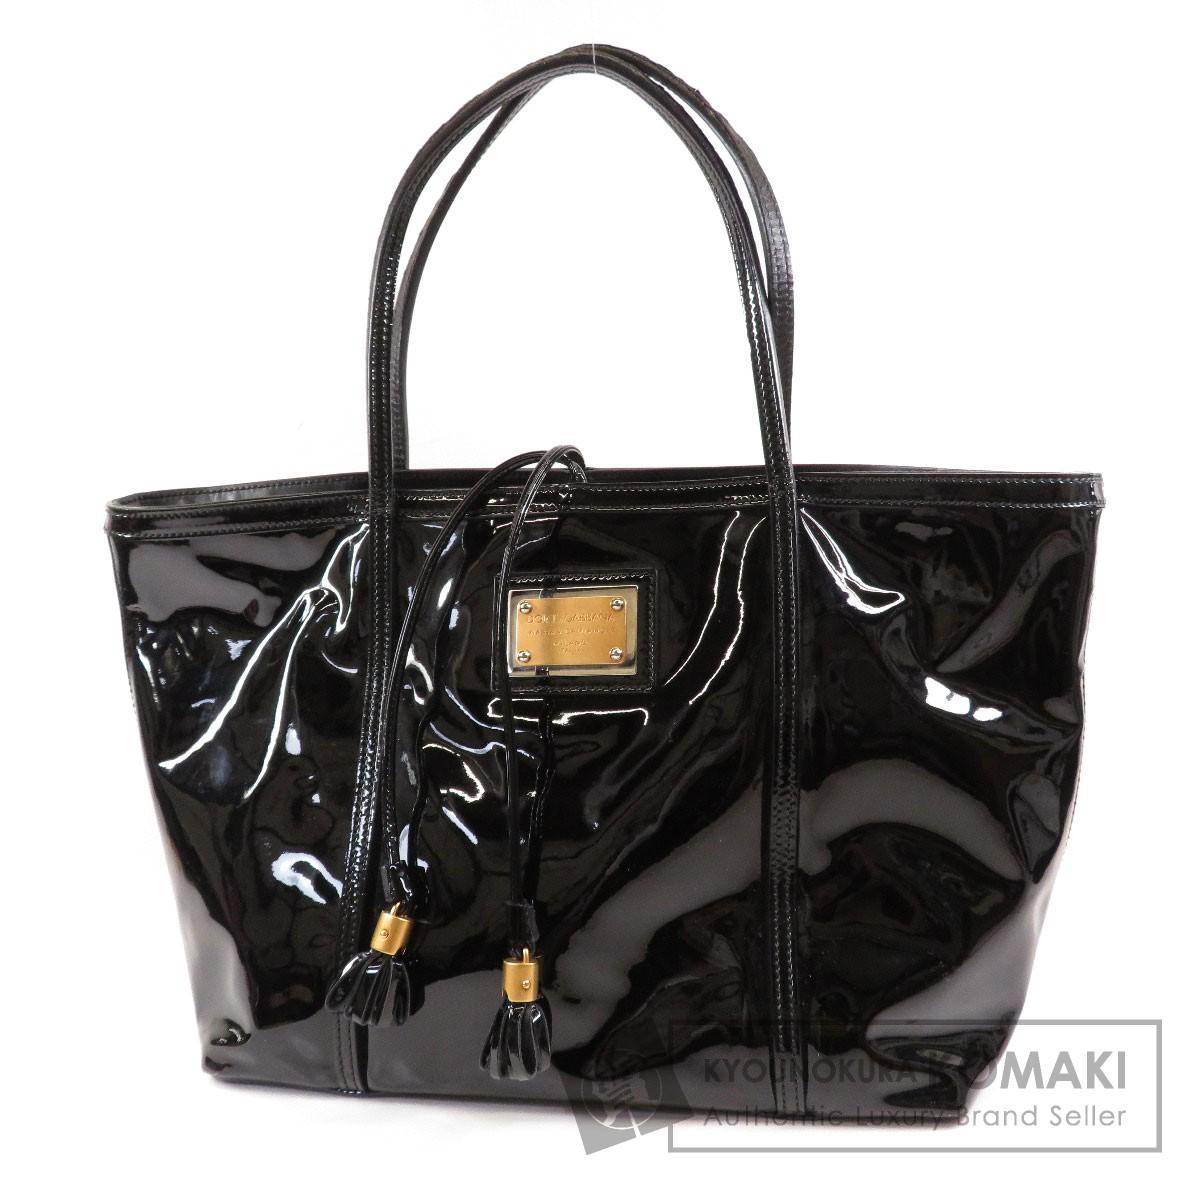 Dolce&Gabbana ロゴプレート トートバッグ PVC レディース 【中古】【ドルチェアンドガッバーナ】